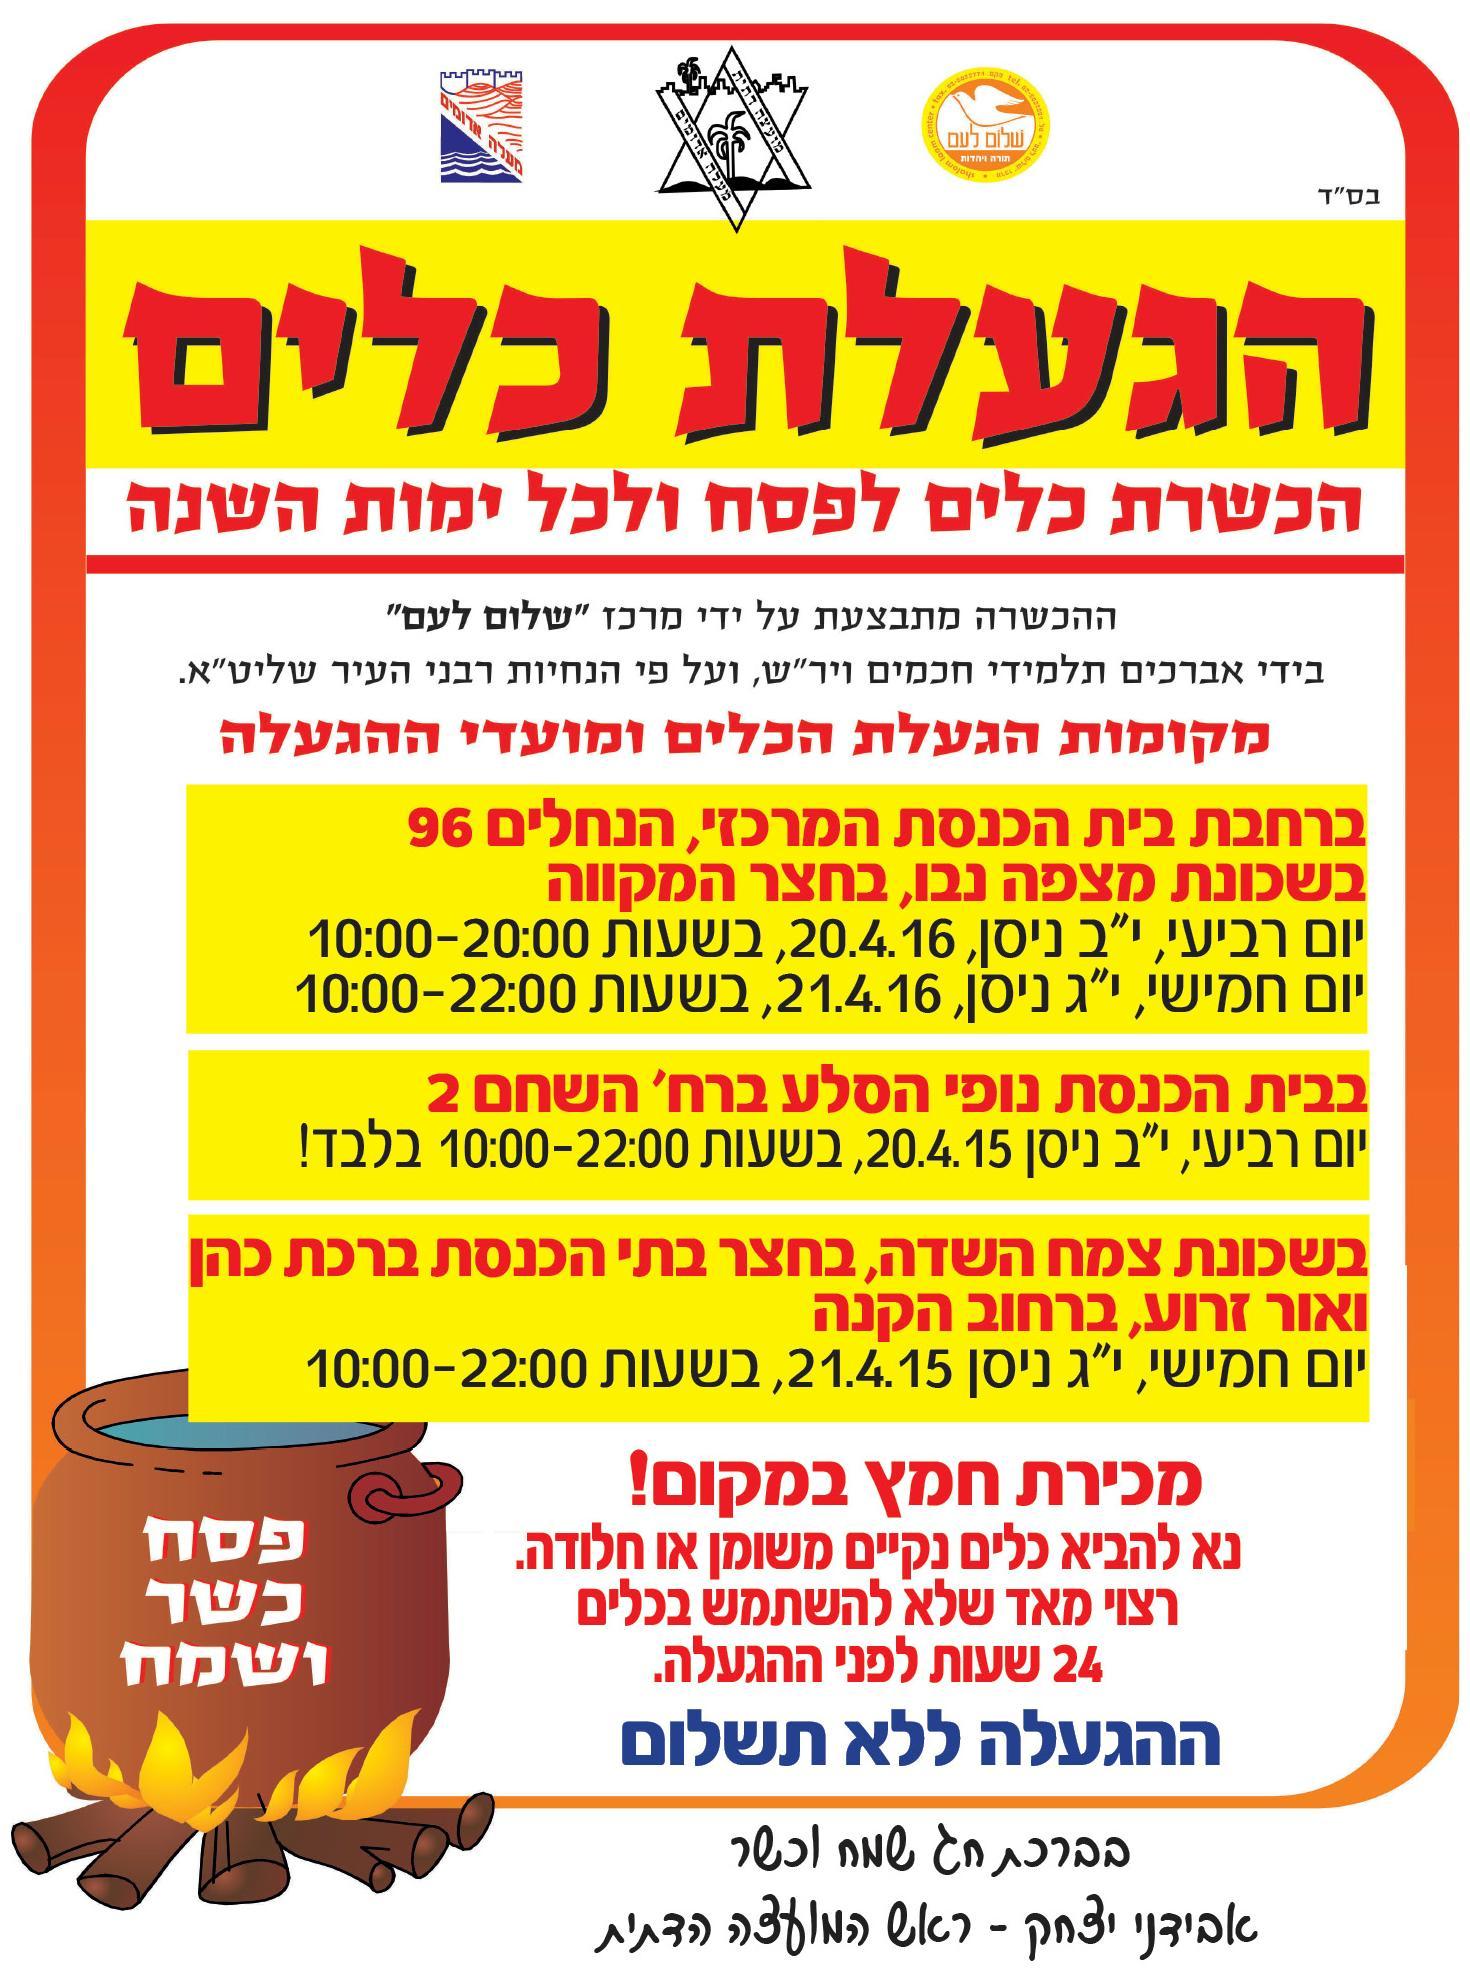 Ma'ale Adumim Pesach Toveling